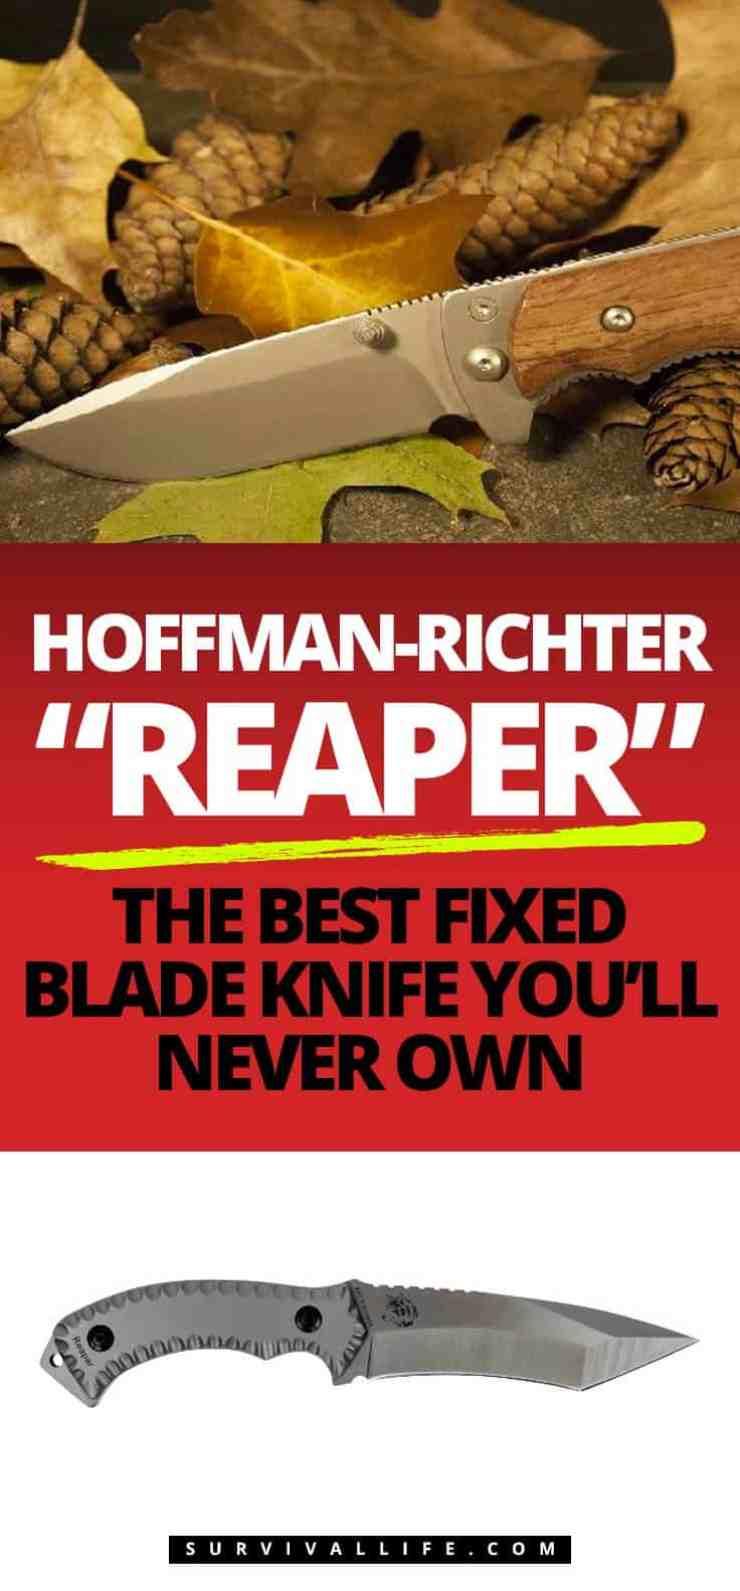 "Hoffman-Richter ""Reaper"": The Best Fixed Blade Knife You'll Never Own"